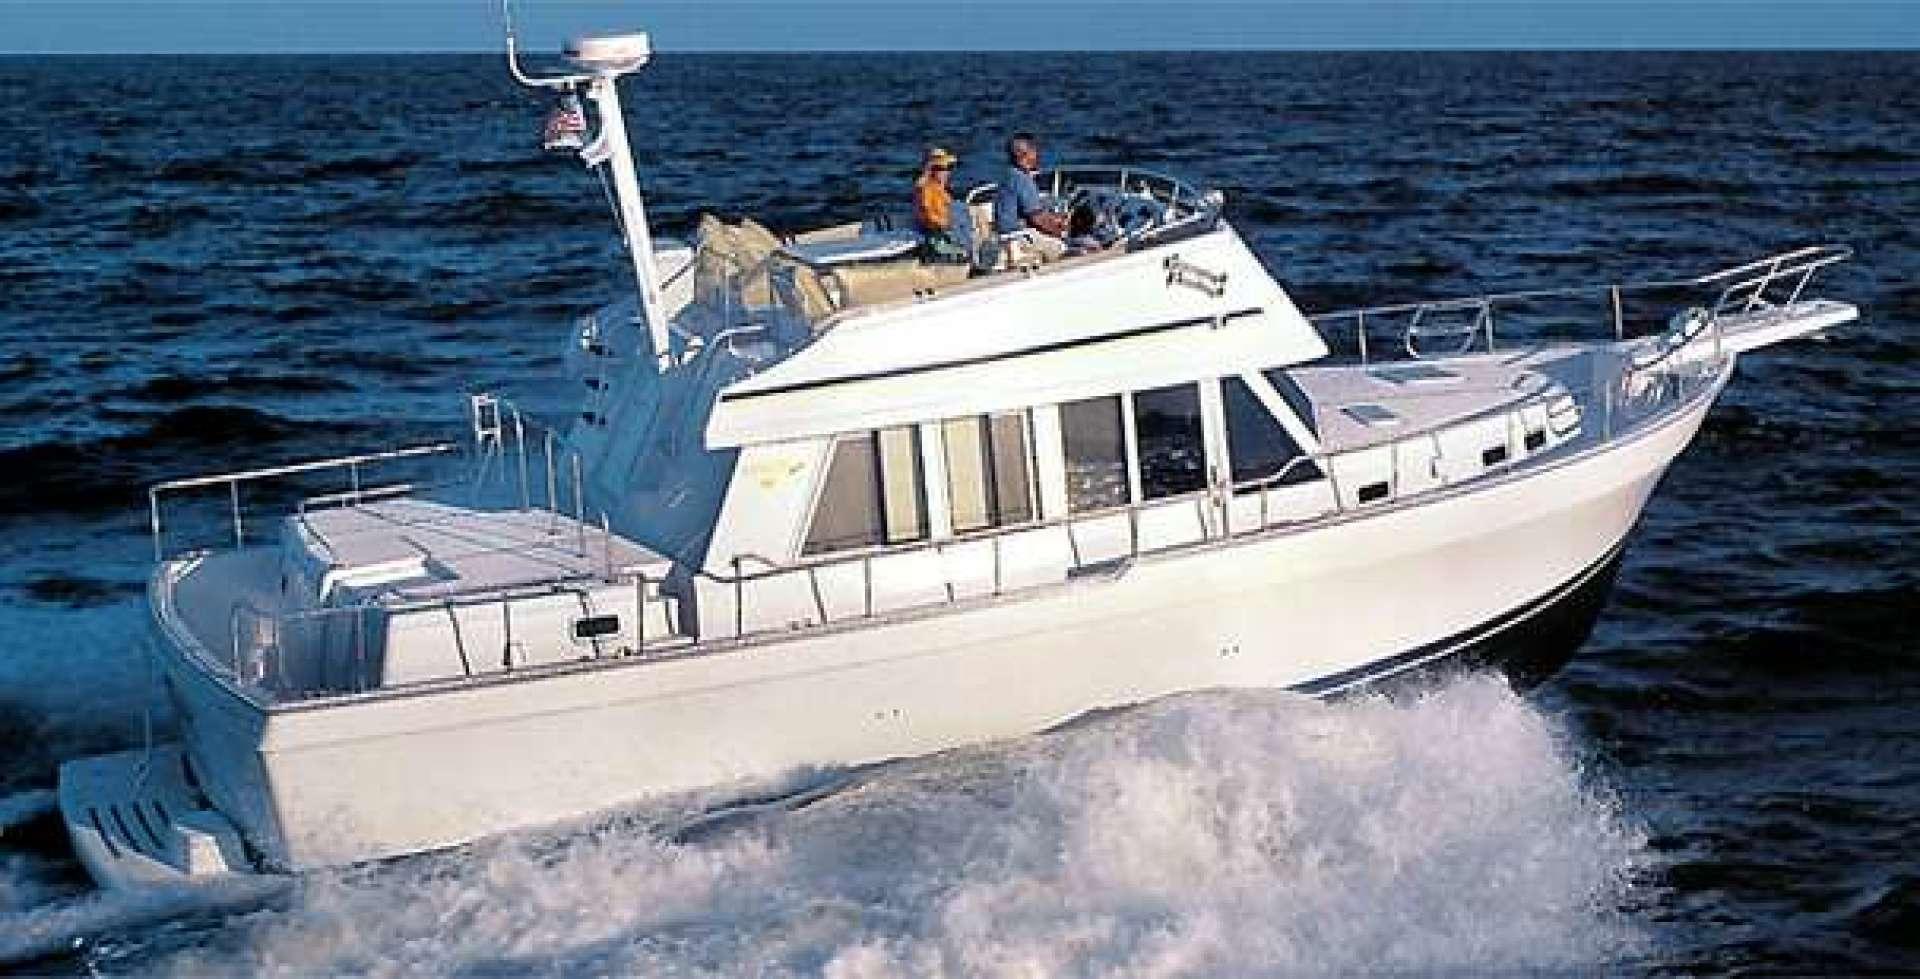 43' Mainship 2001 430 Trawler OLD SCHOOL